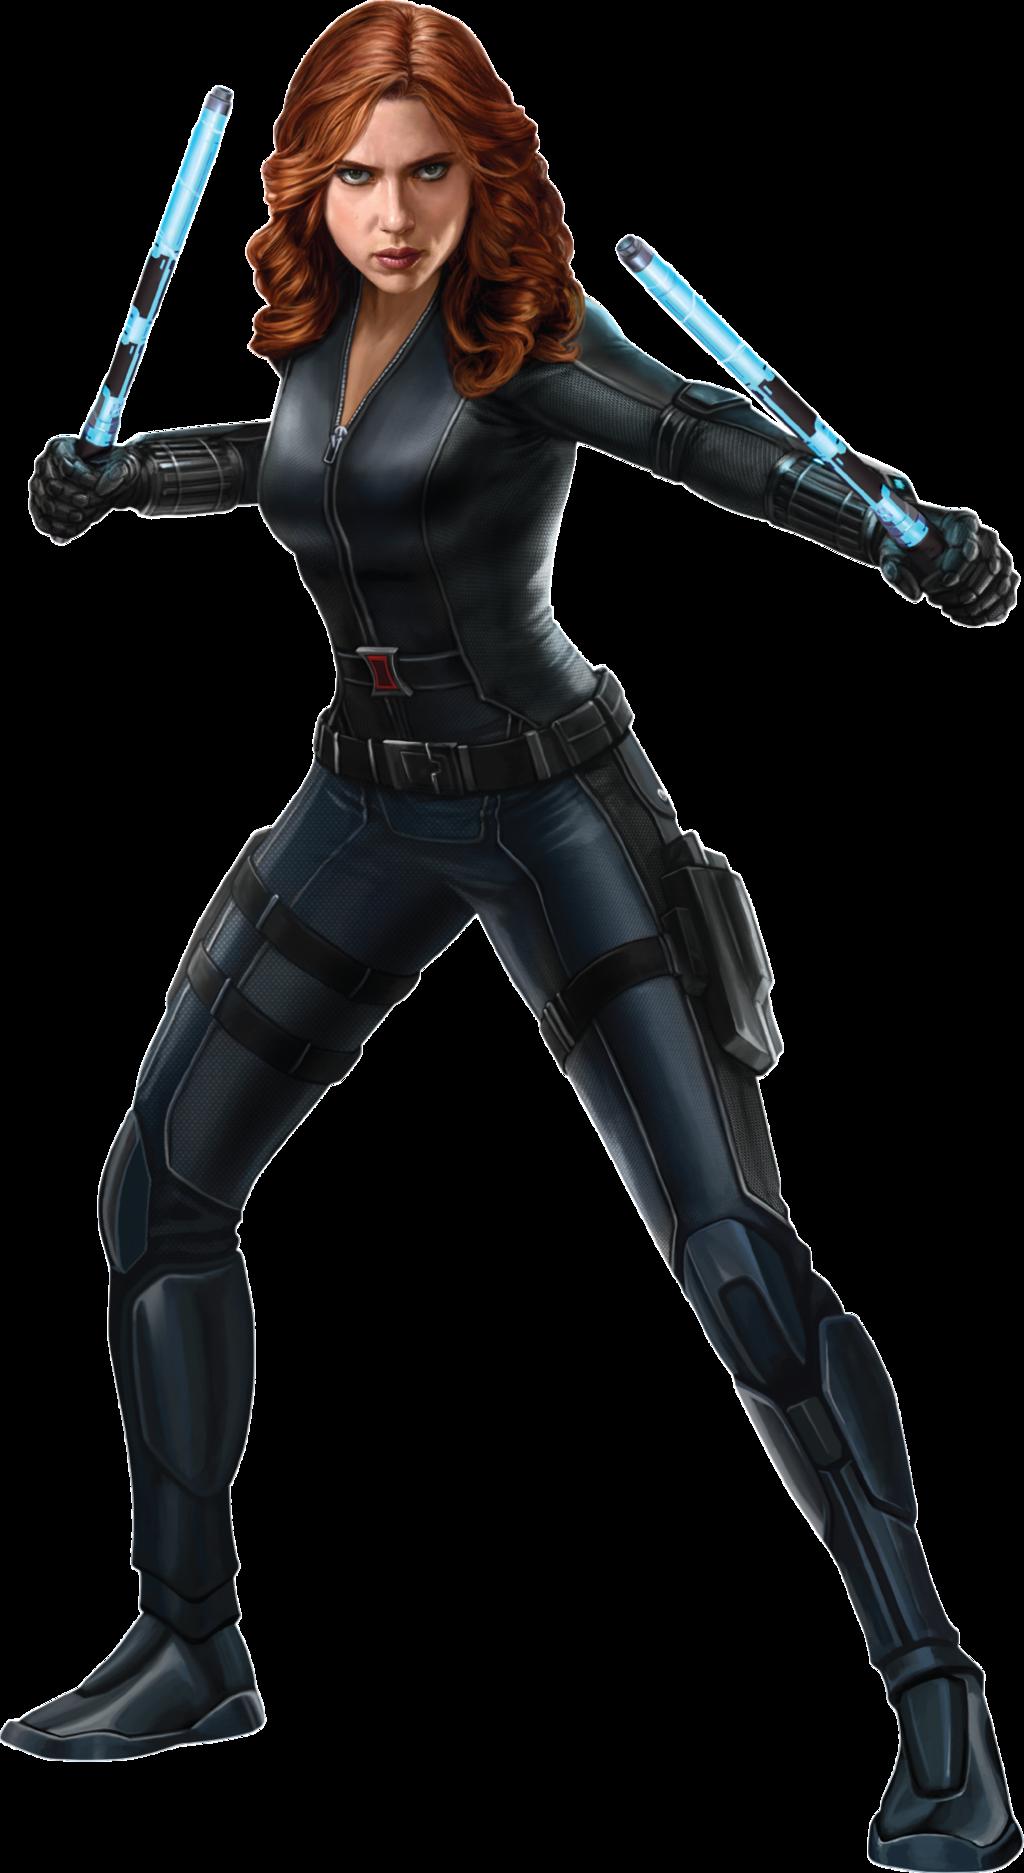 clipart black and white Avengers clipart black widow. Female art captain america.